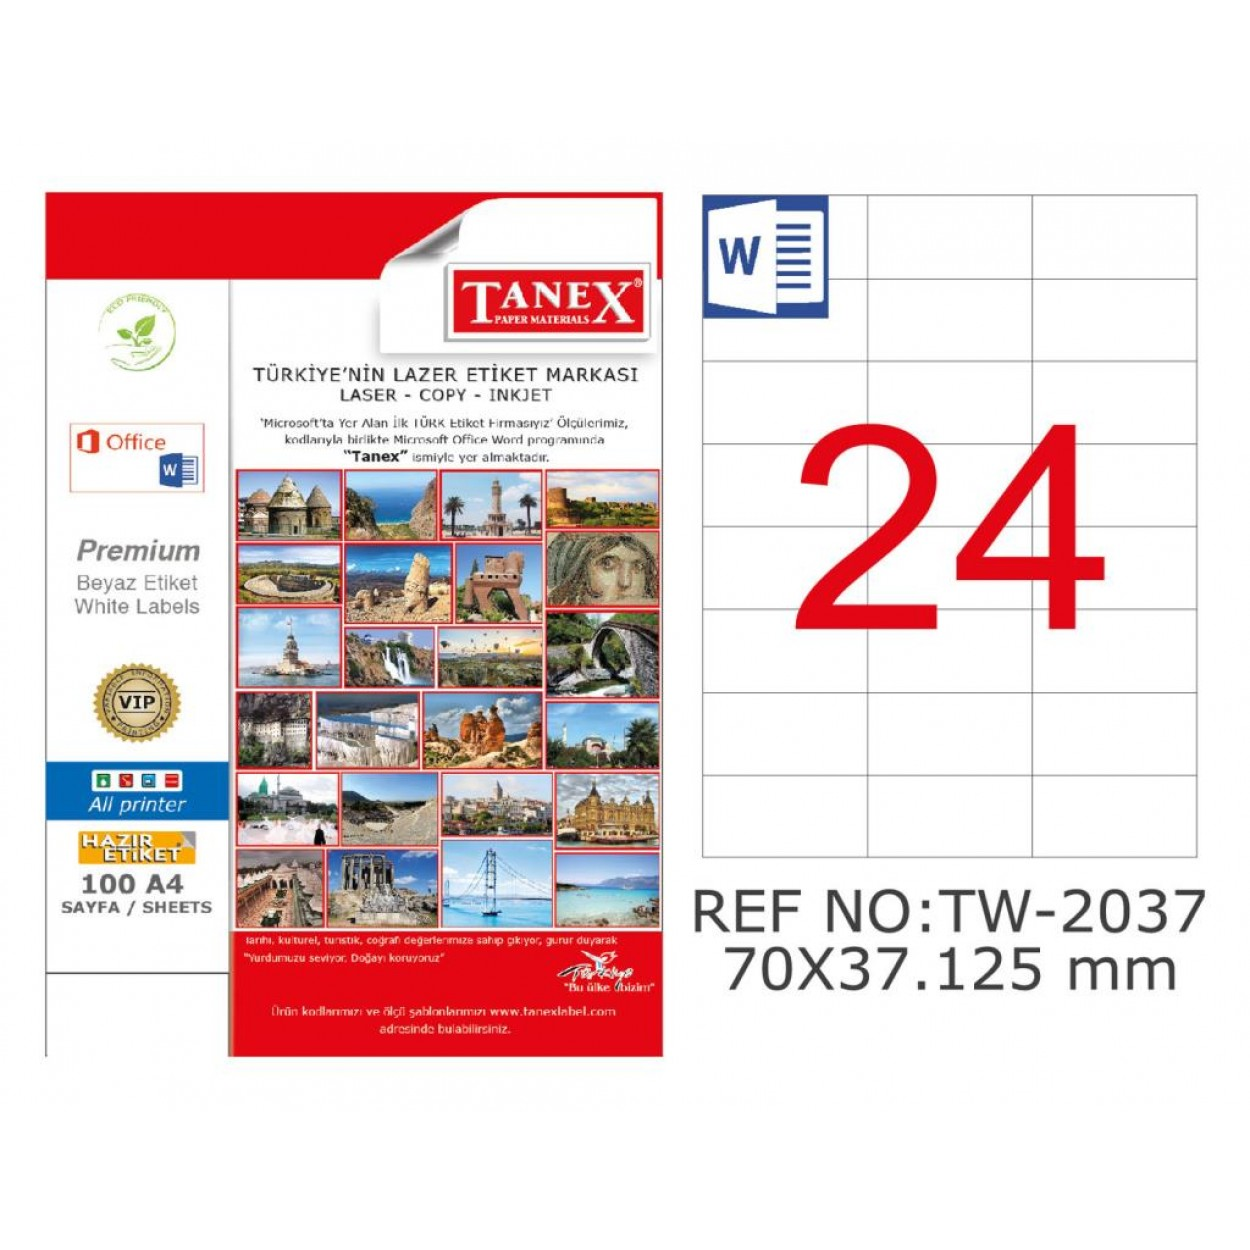 Tanex TW-2037 70x37.125mm Kuşe Laser Etiket 100 Lü Paket